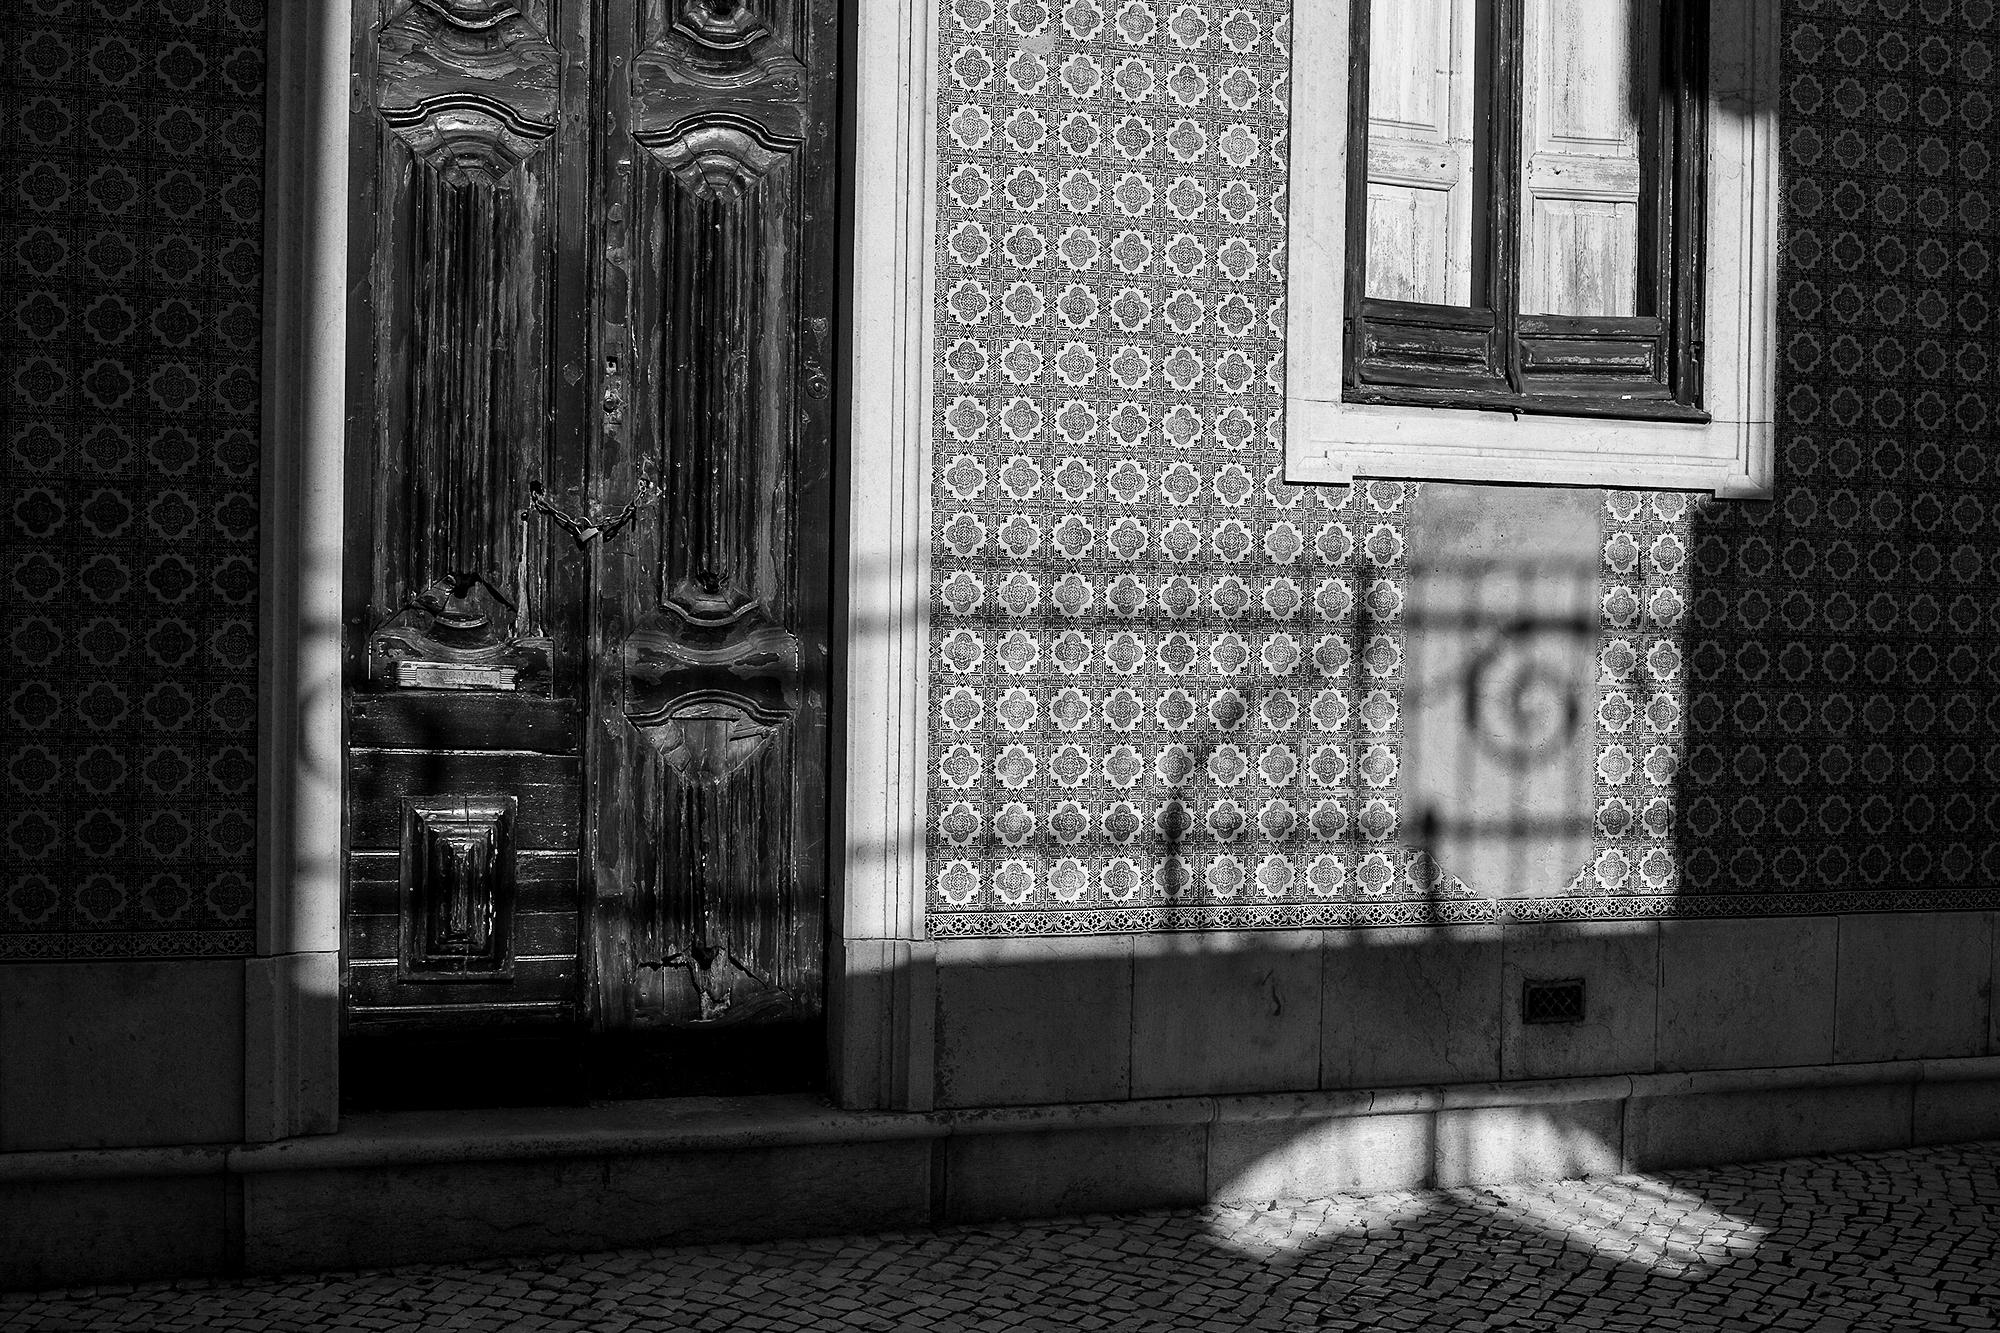 © Rodrigo Cabral Faro 2016